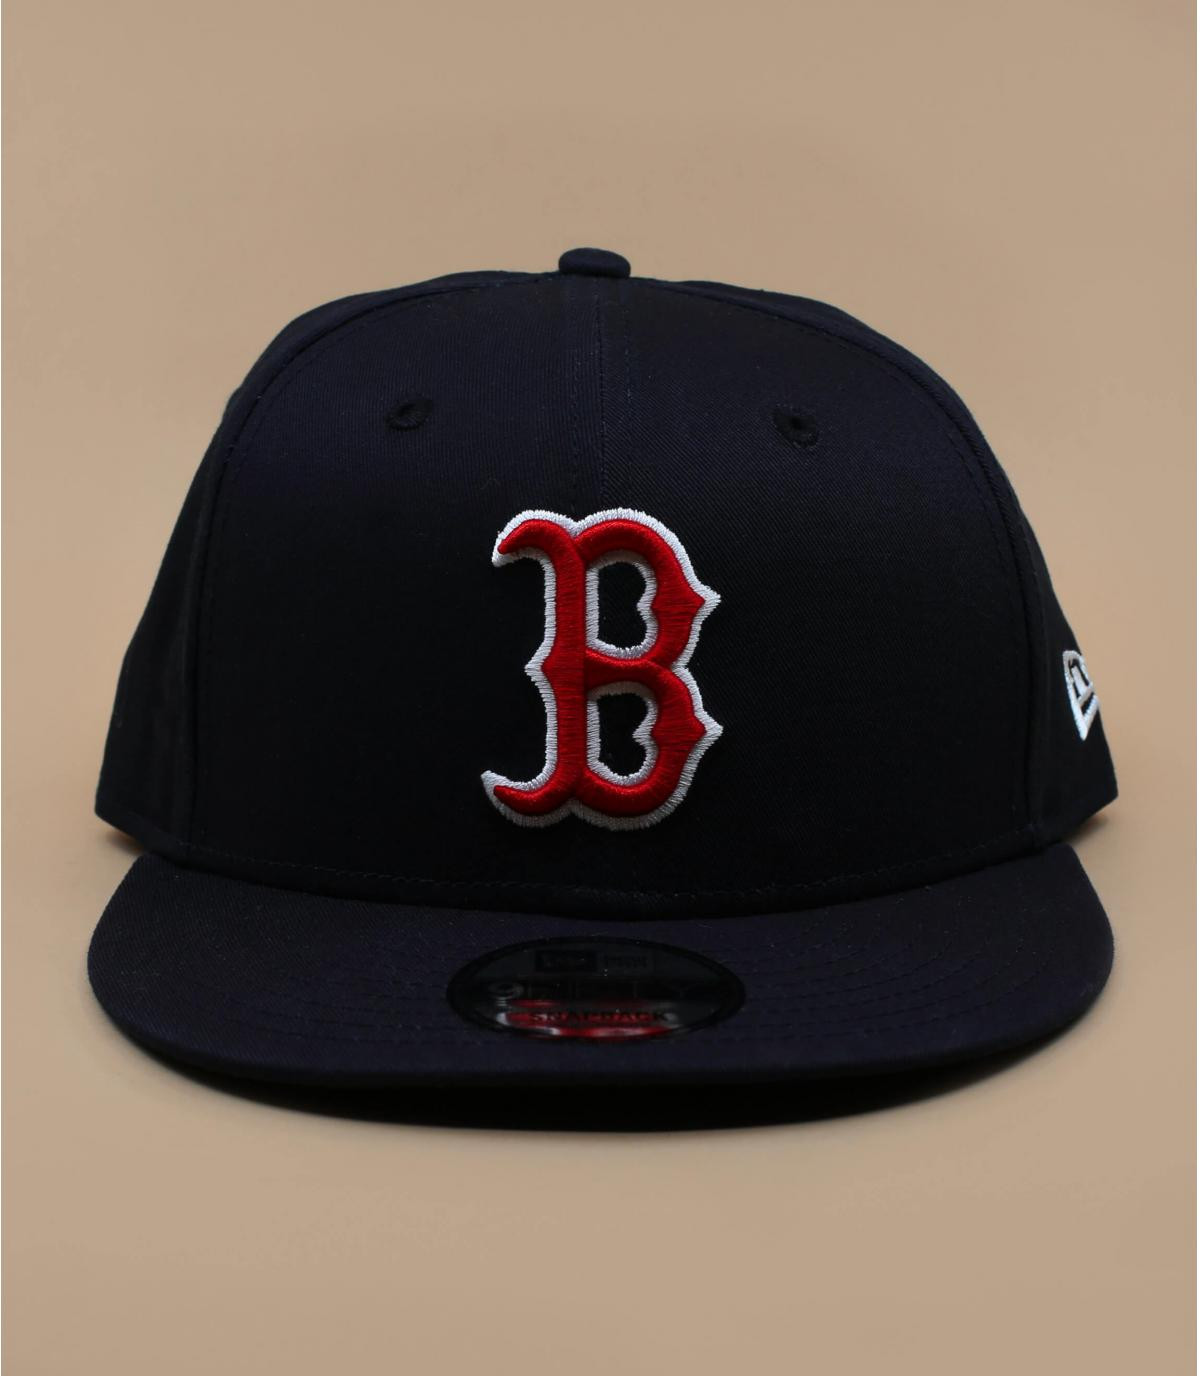 New era boston snapback - Snapback Boston team by New Era. 048493ed650